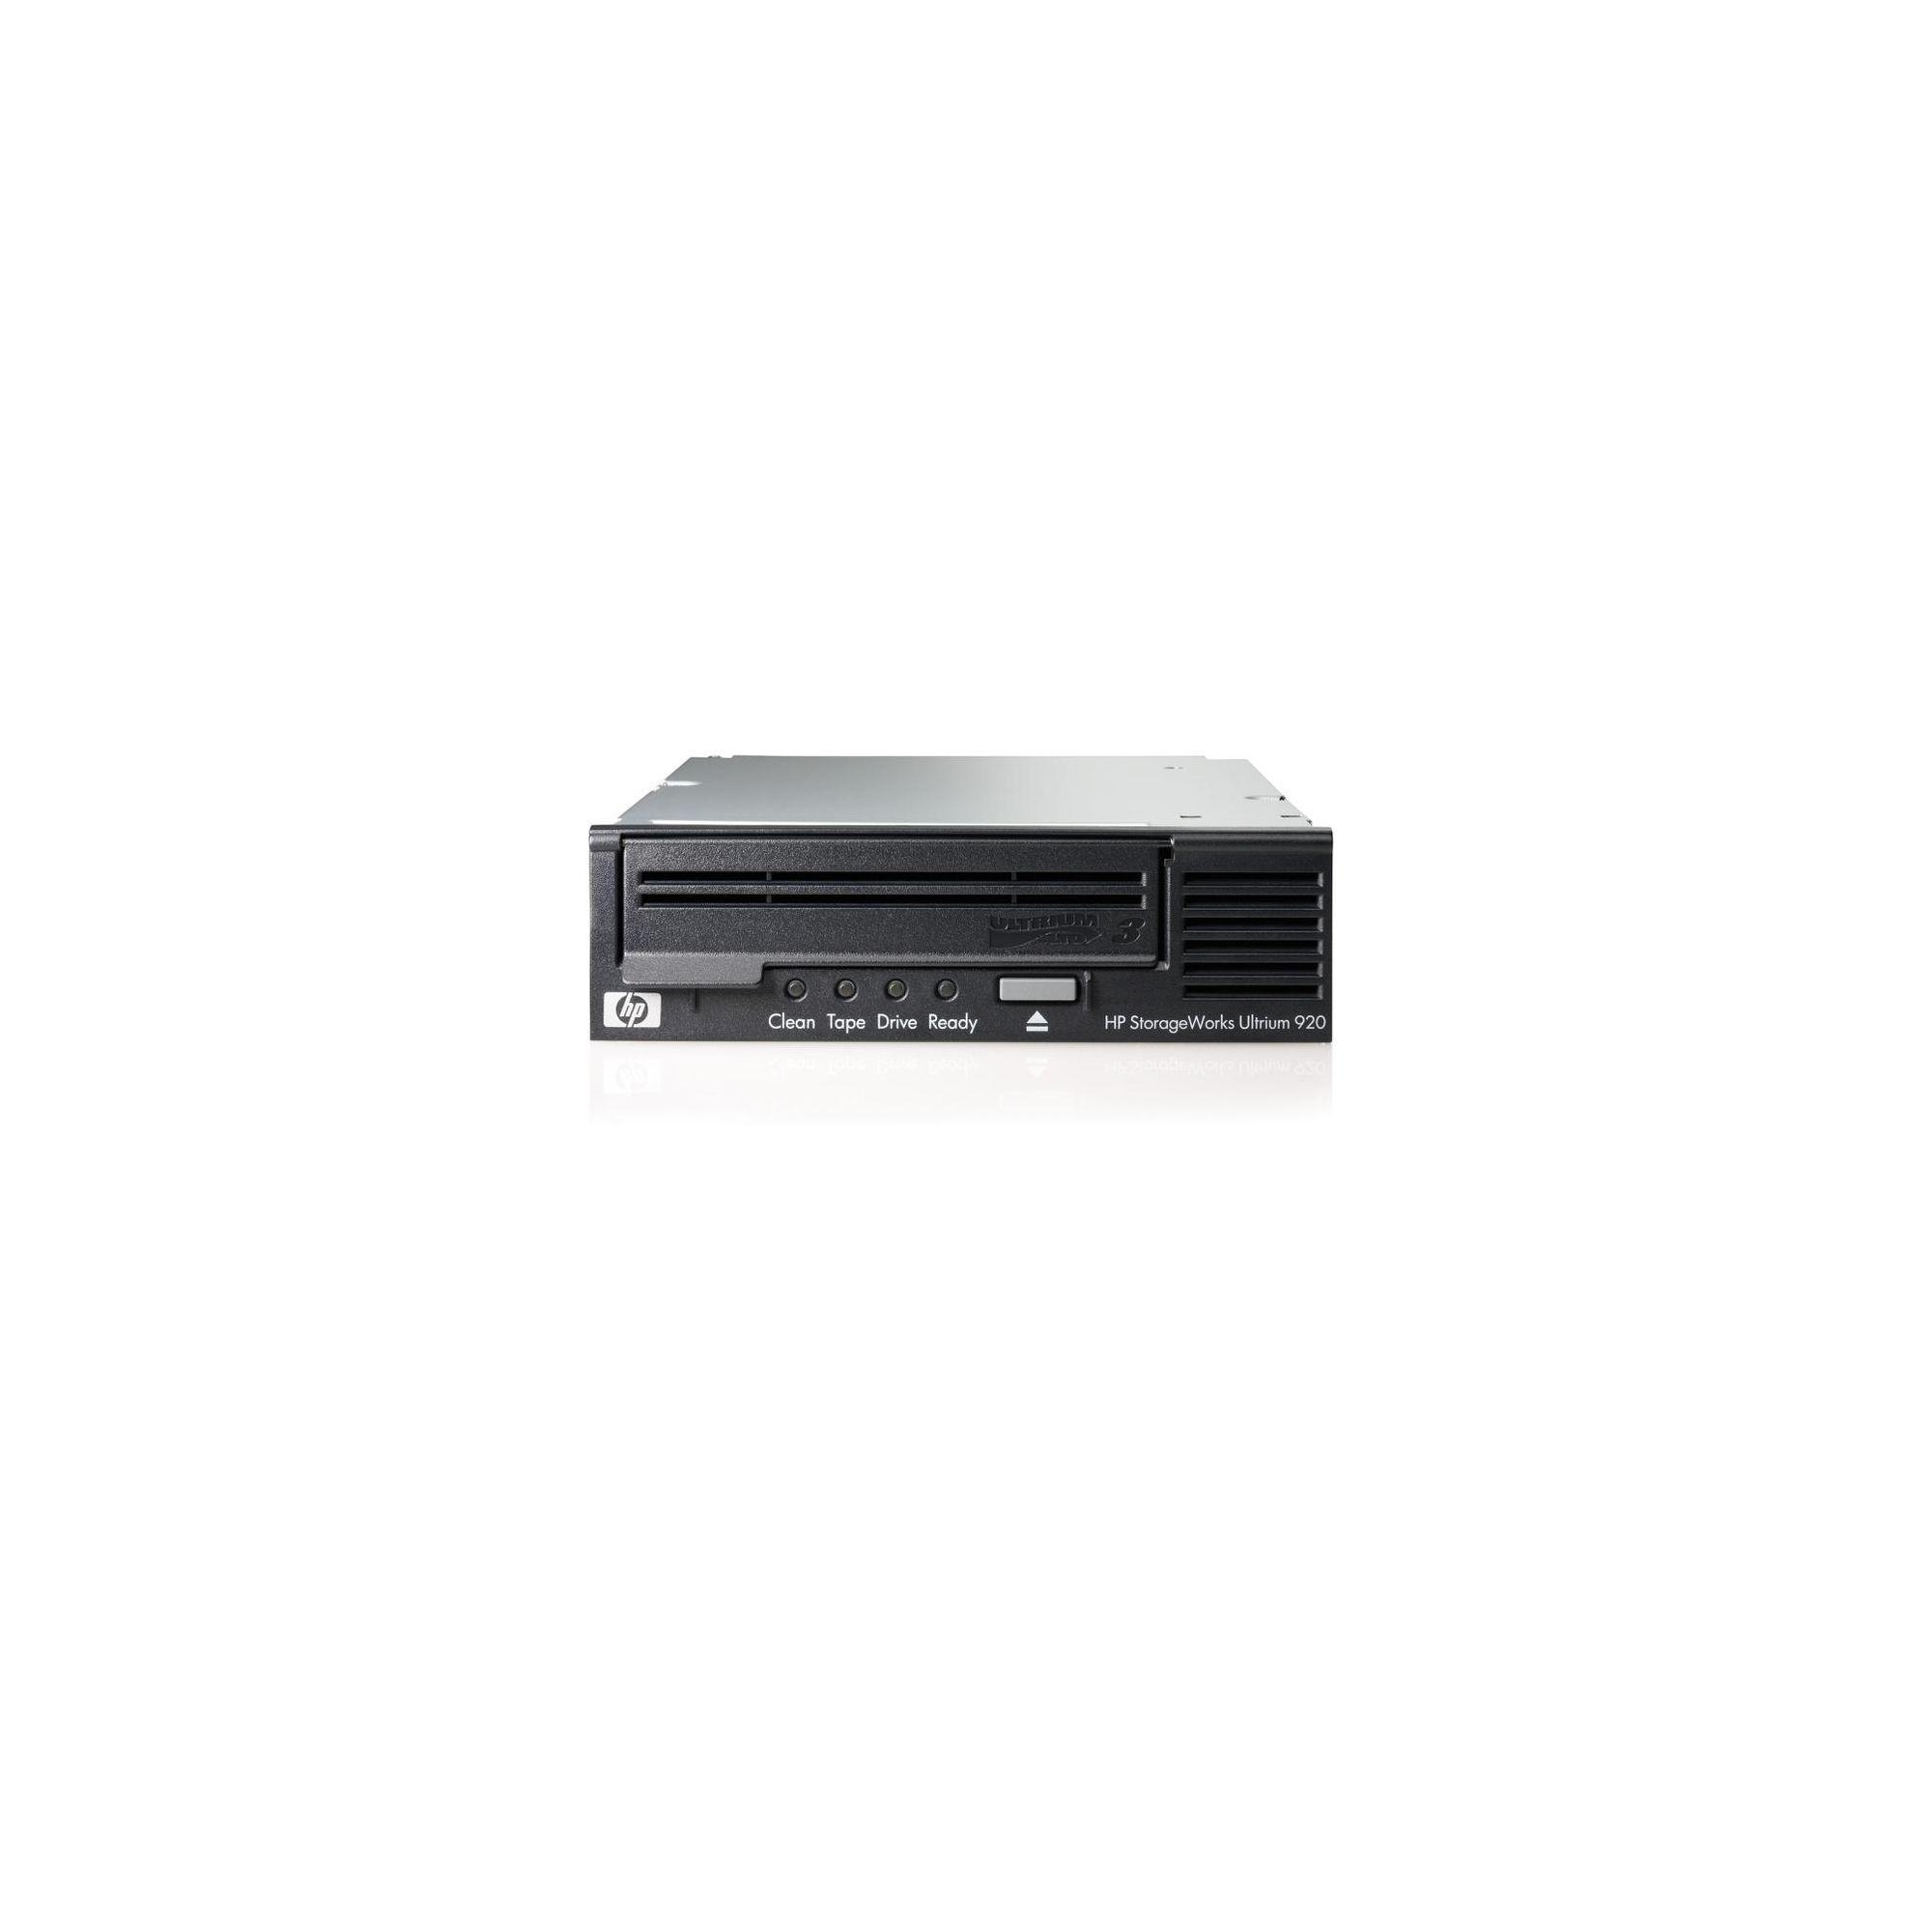 HP StorageWorks Ultrium 920 SCSI Internal Tape Drive at Tesco Direct